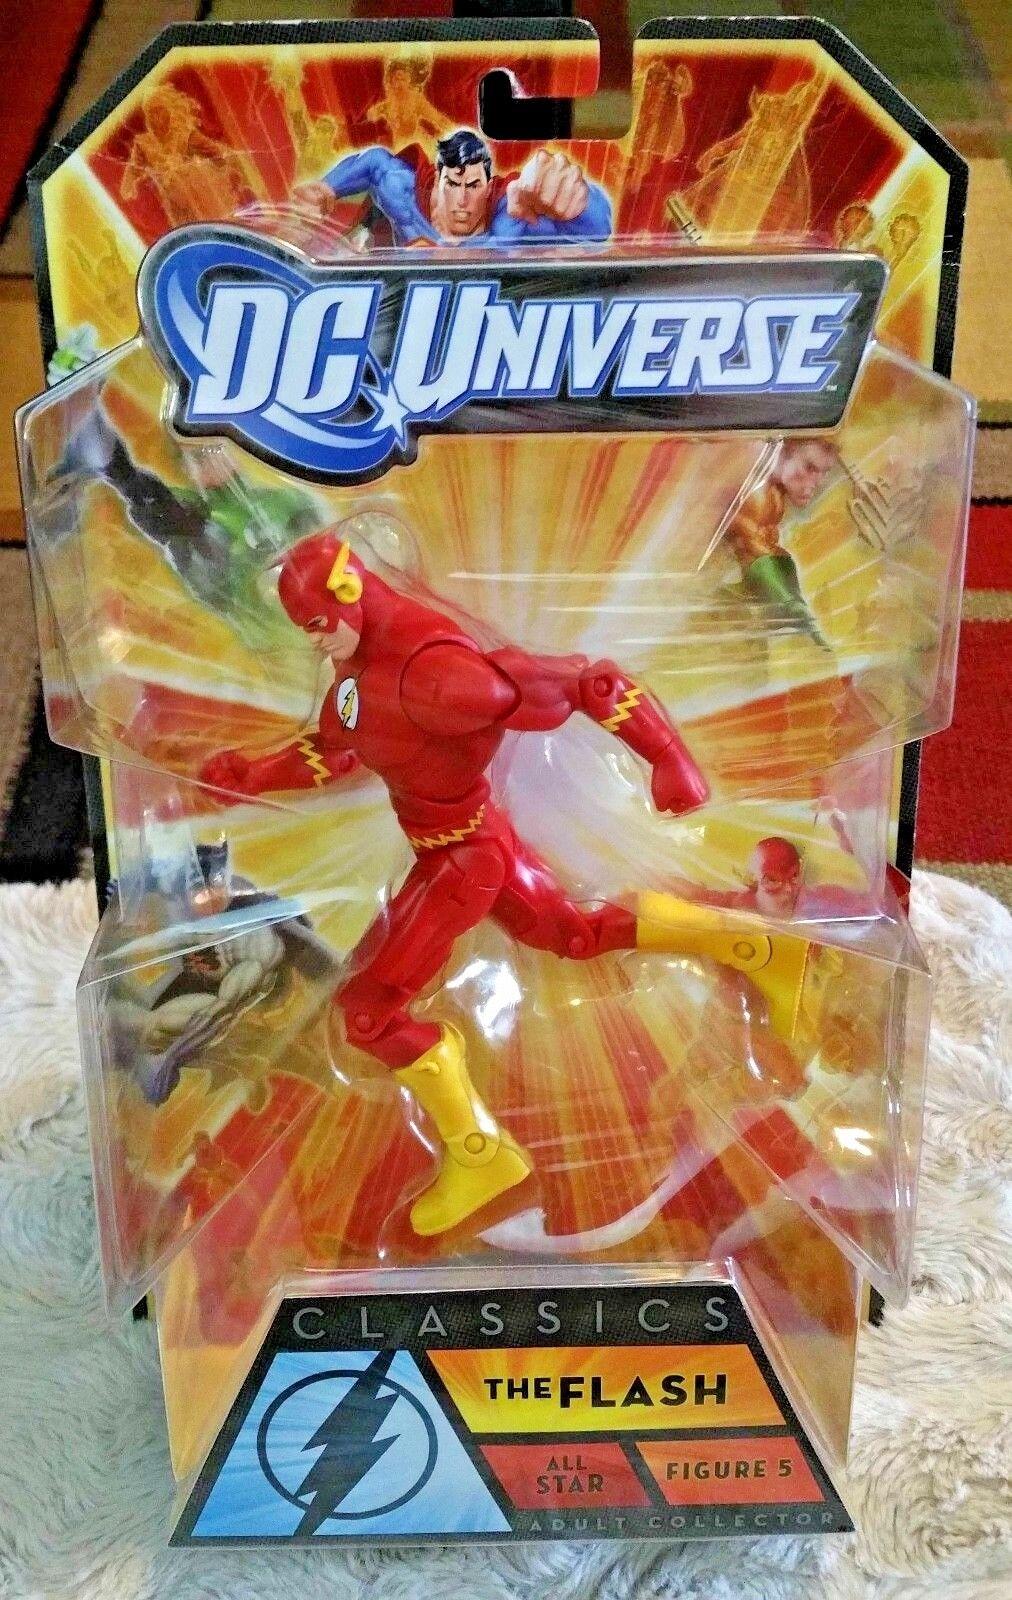 Dc - universum - klassiker der flash - all - star - welle abbildung 5